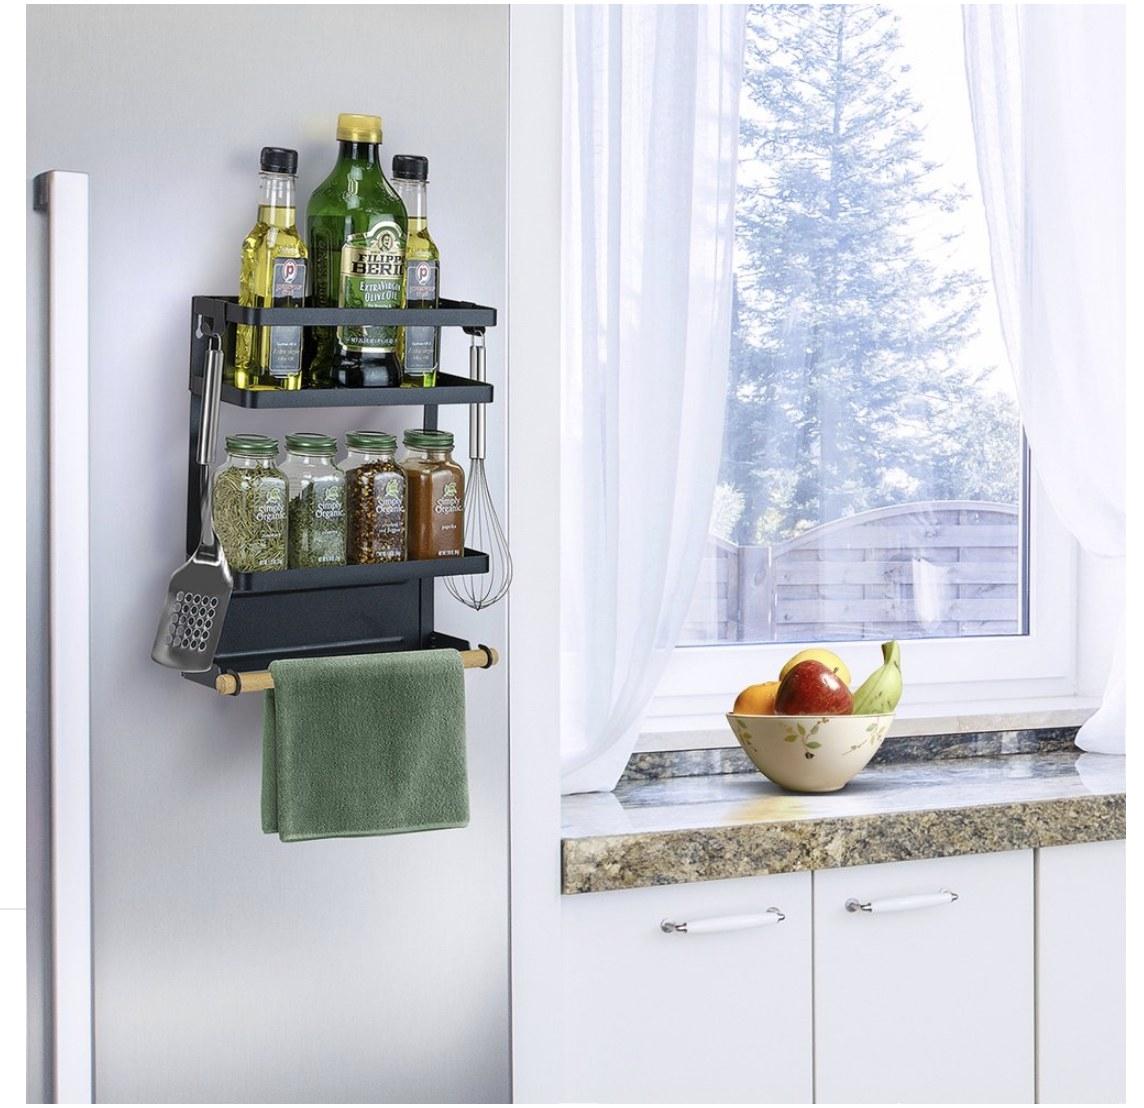 A spice rack shelf hanging from a fridge